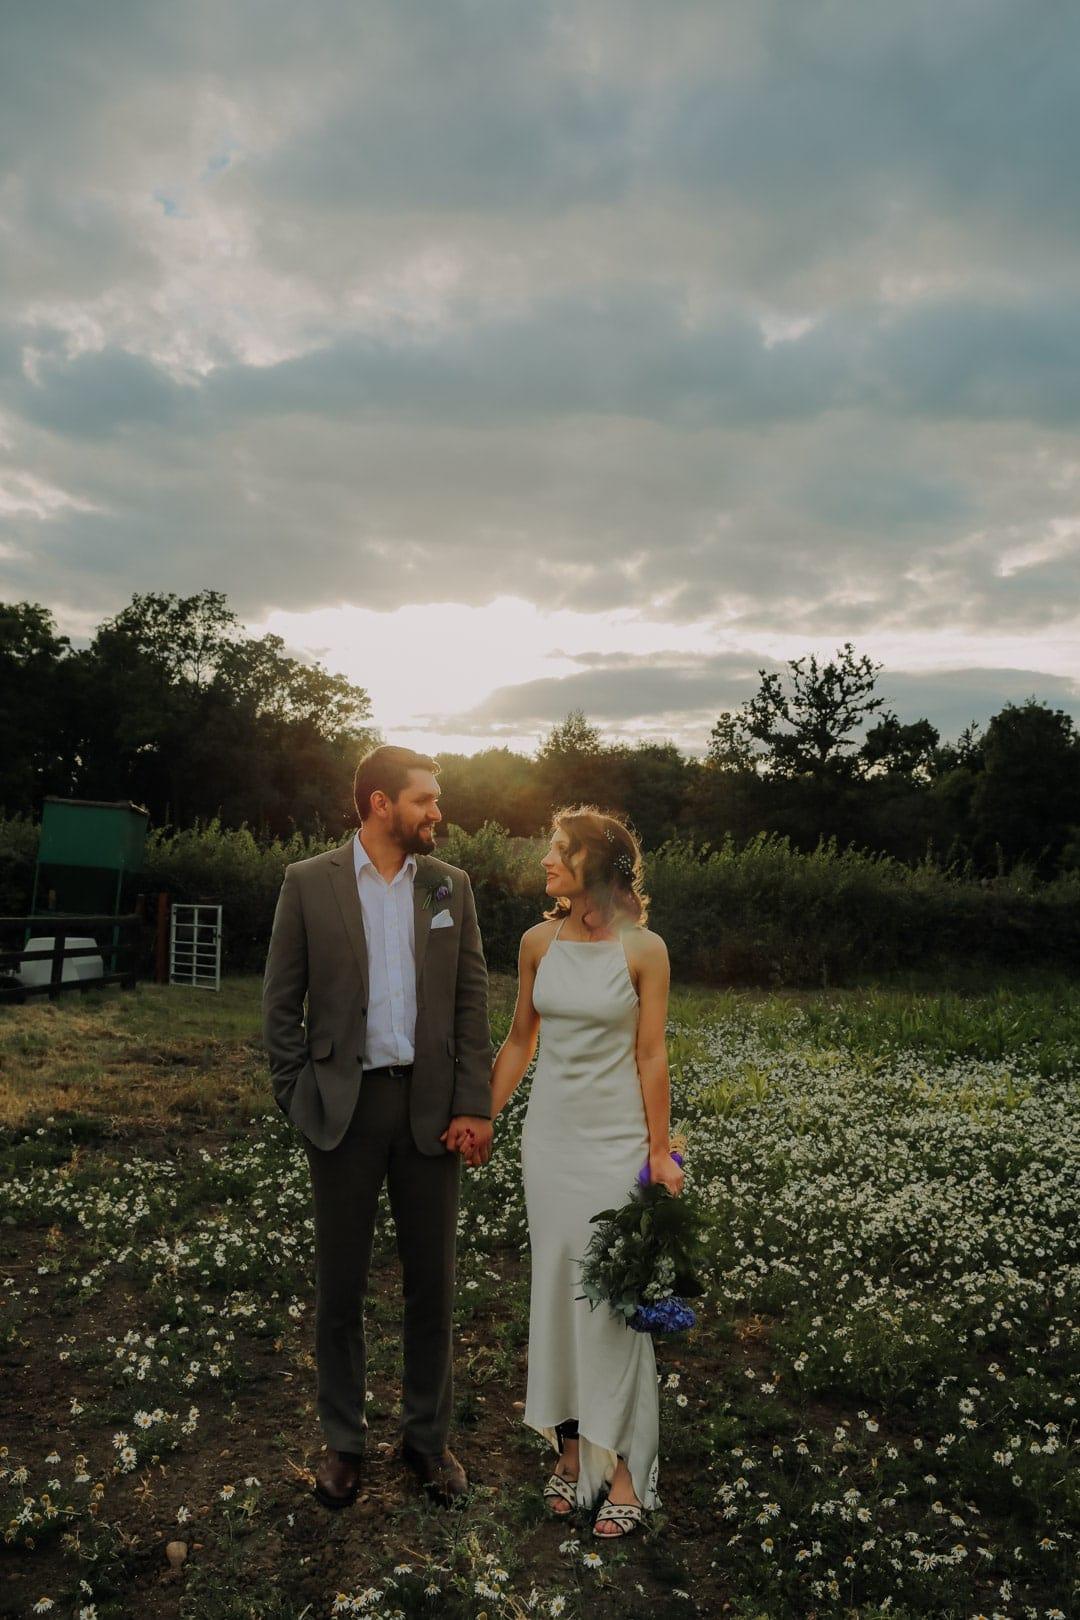 golden-hour-portrait-bride-groom-leicestershire-wedding-photographer